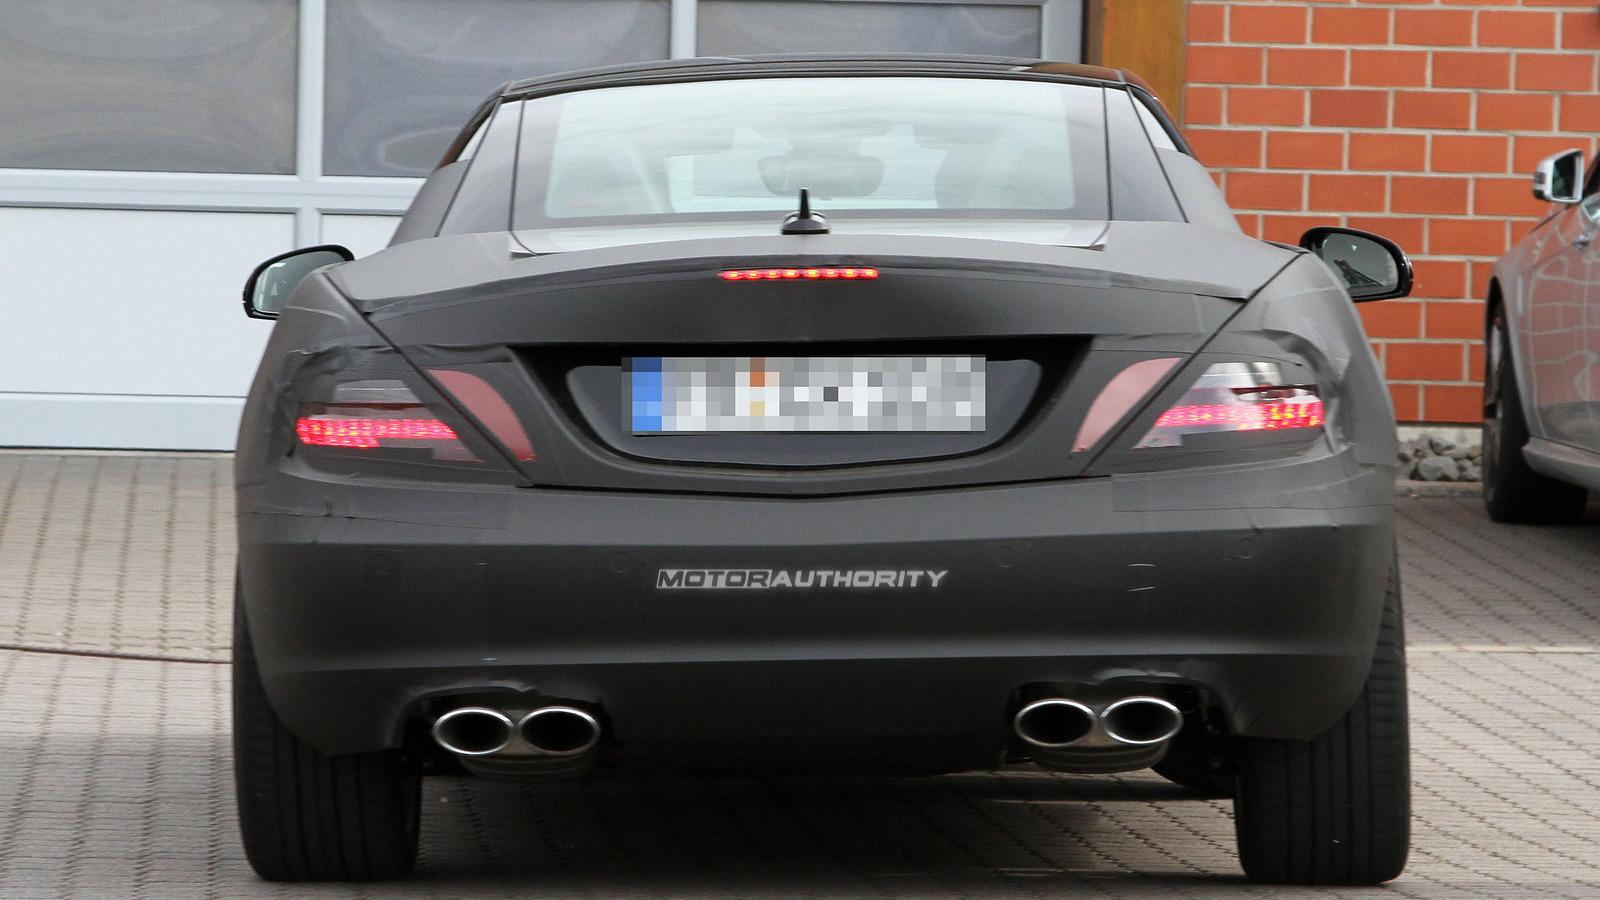 Spy Shots: 2012 Mercedes-Benz SLK AMG